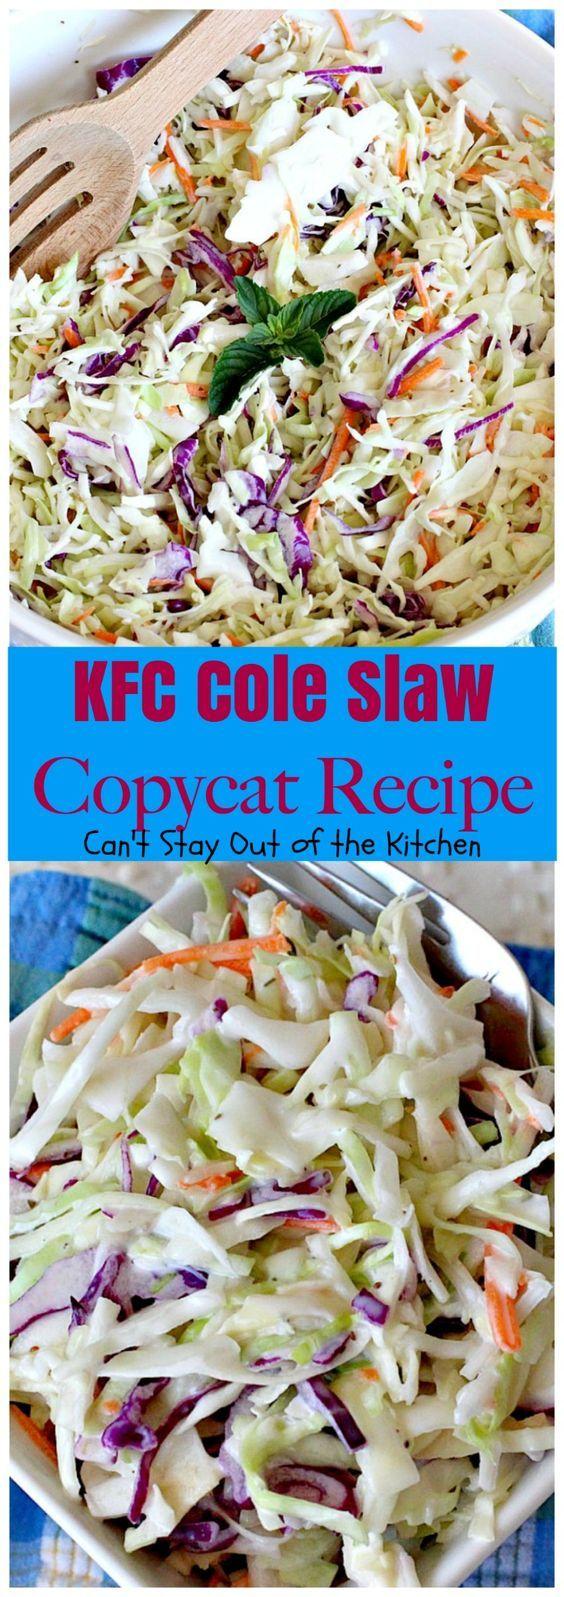 16oz shredded cole slaw 1/2 c hellmann's mayonnaise 1/4 c buttermilk 1/4 c milk 1 1/2t white vinegar 2 1/2t lemon juice 1/3 cup sugar 1/2t salt 1/8t pepper 1/2t celery seed